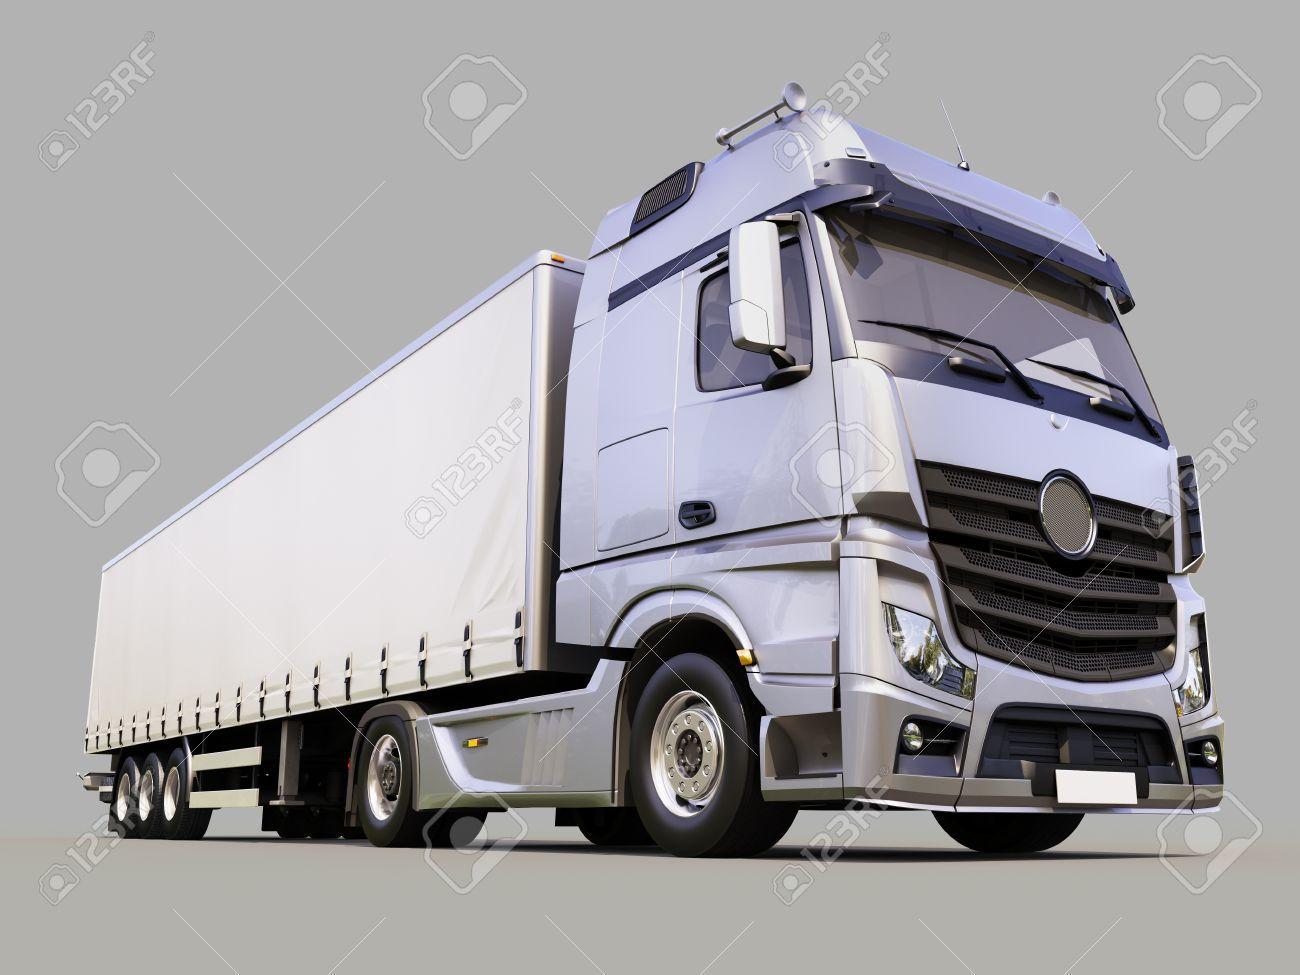 A modern semi-trailer truck on gray background - 21644505